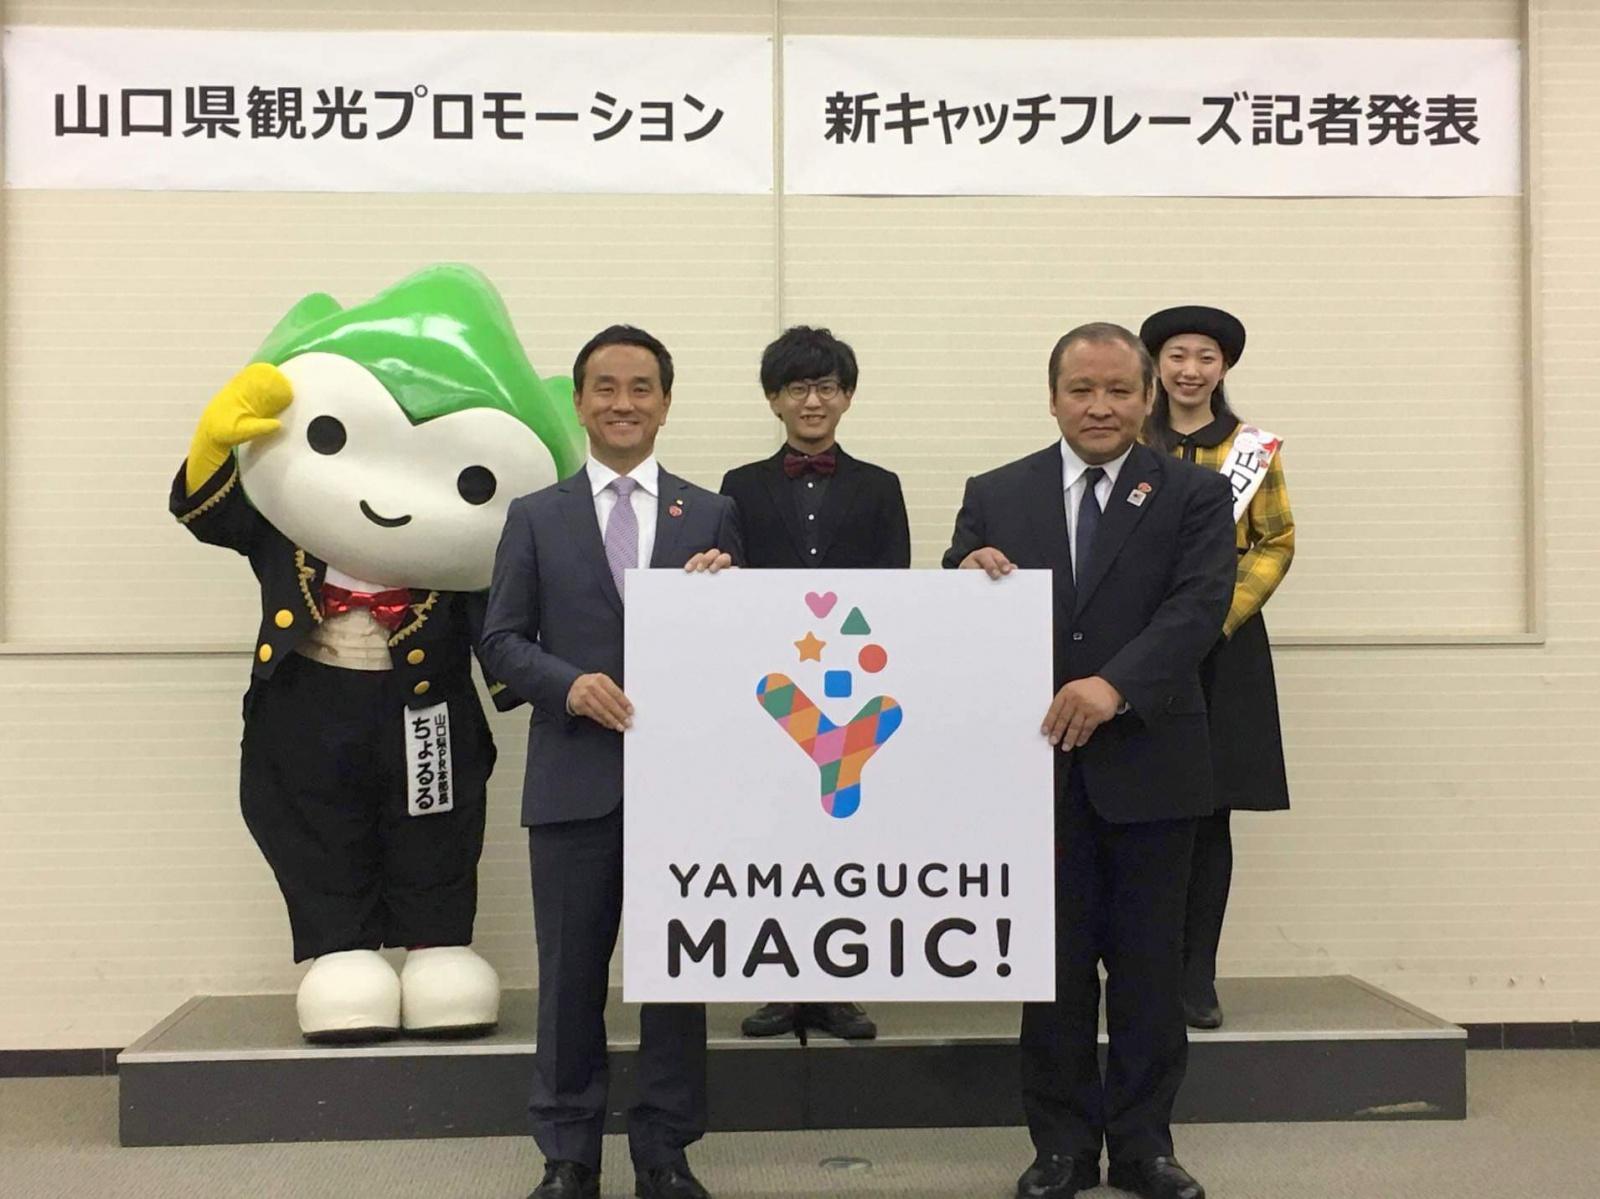 「YAMAGUCHI MAGIC!」新しい観光プロモーションのキャッチフレーズを発表したよ☆彡